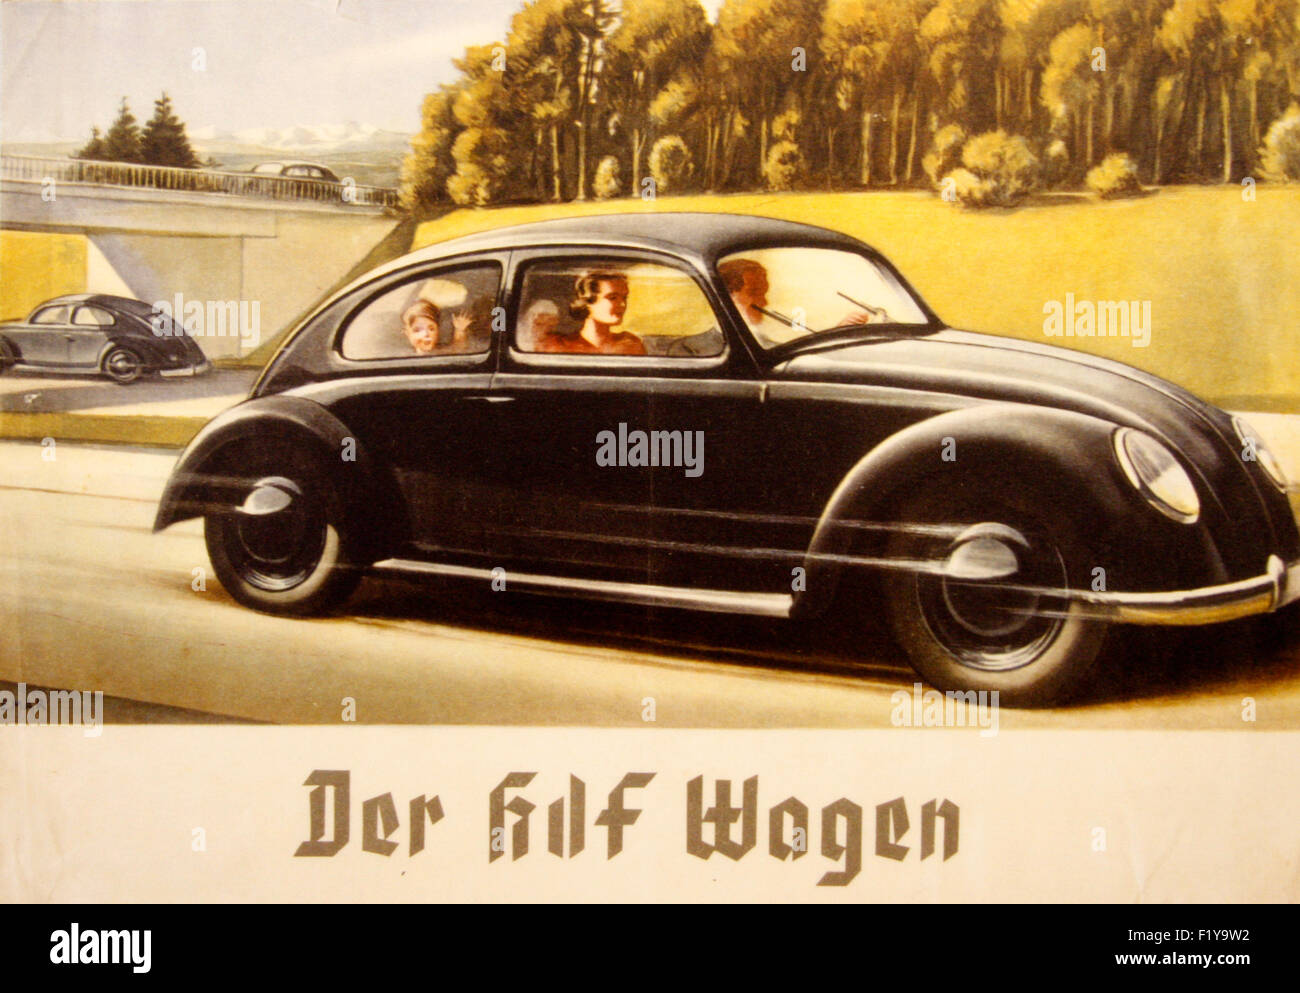 'der KDF-Wagen', Propaganda-Plakat des Dritten Reiches, Dokumentationszentrum Obersalzberg, Berchtesgaden, - Stock Image